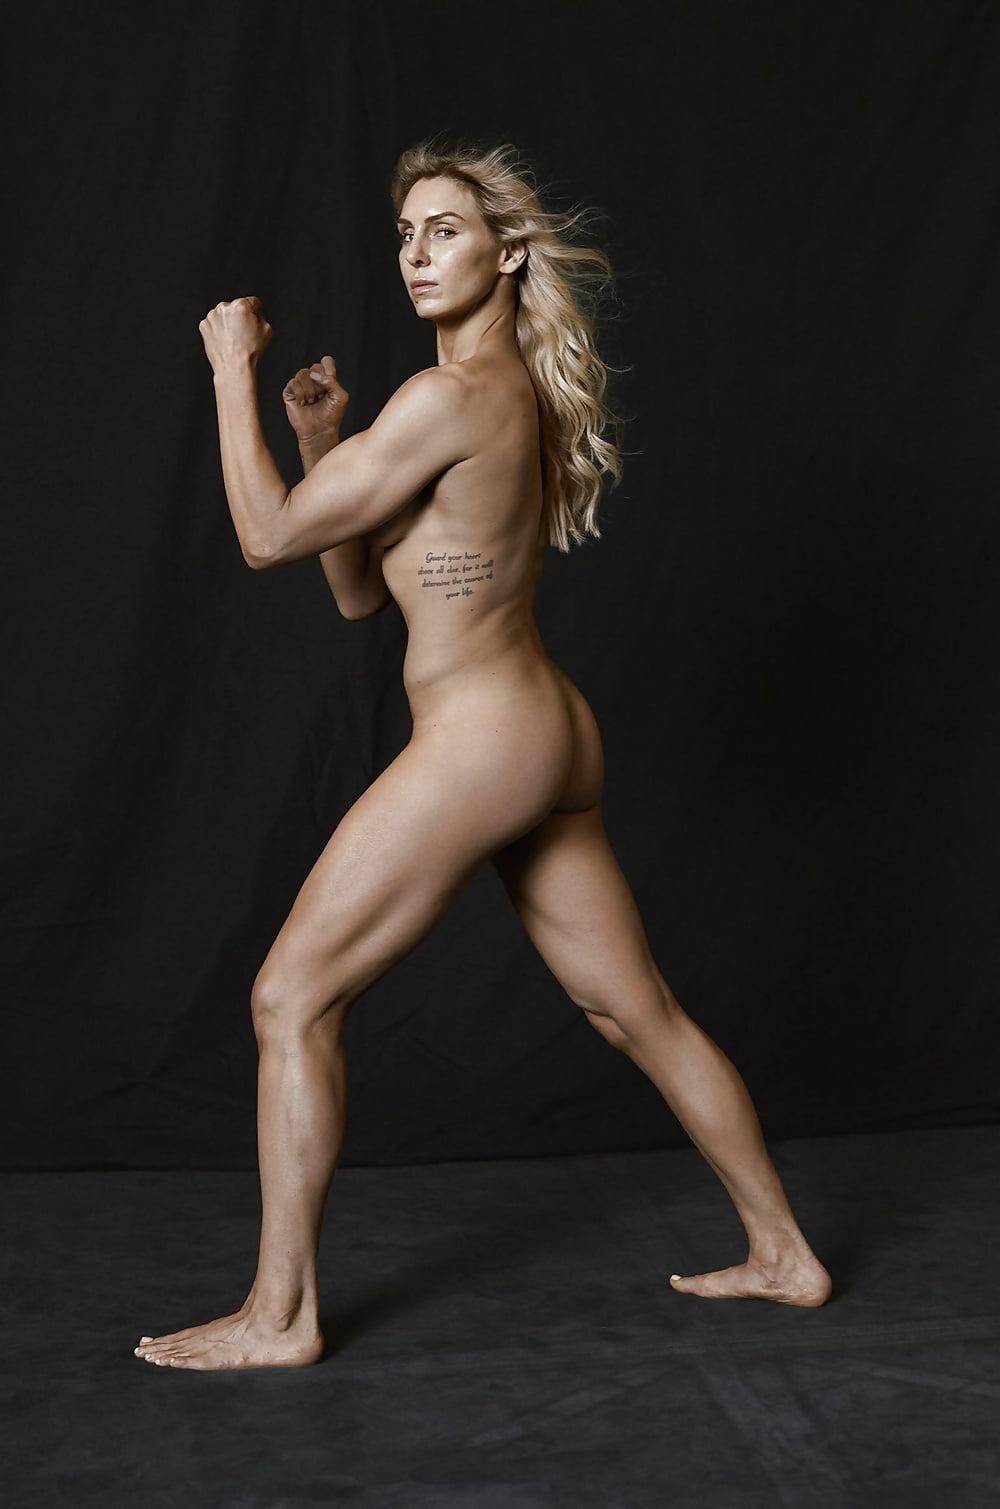 Wwe long nudes — photo 15